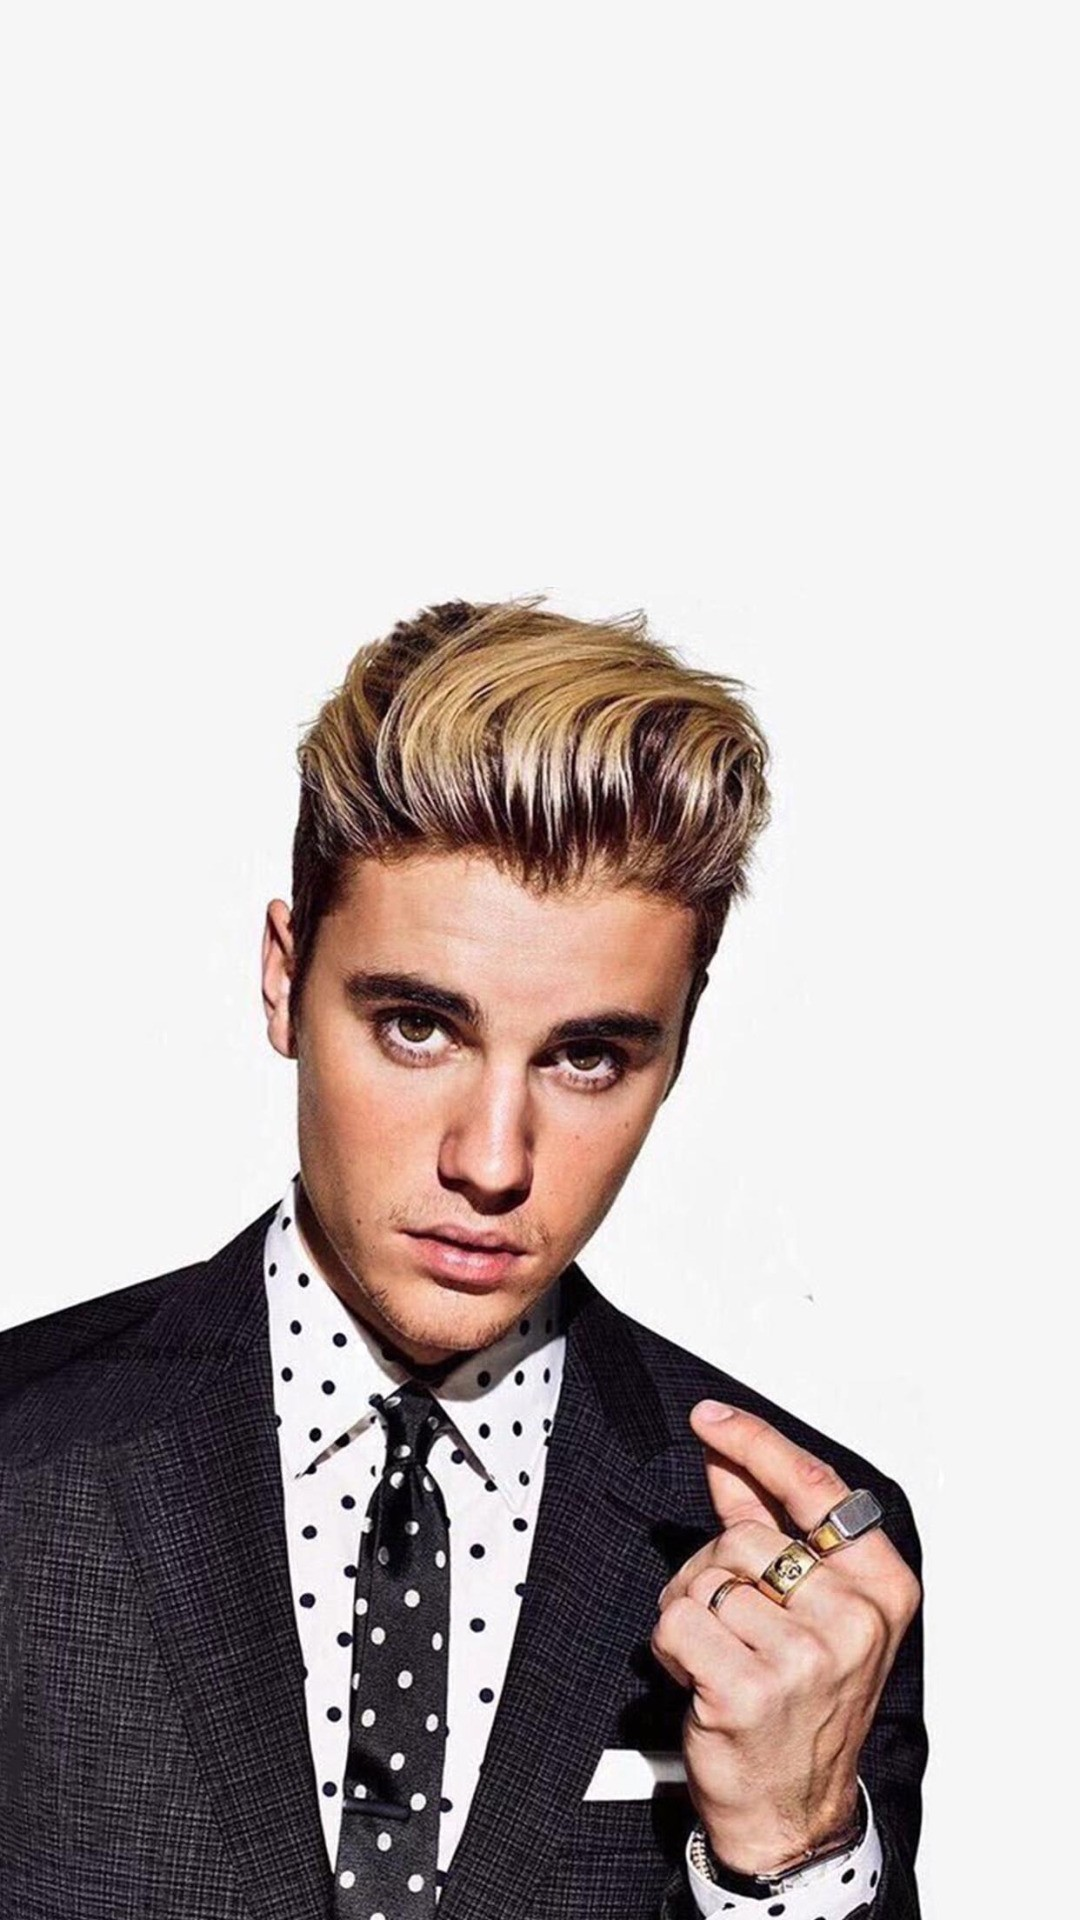 1920x1200 Justin Bieber HD Wallpapers 2013